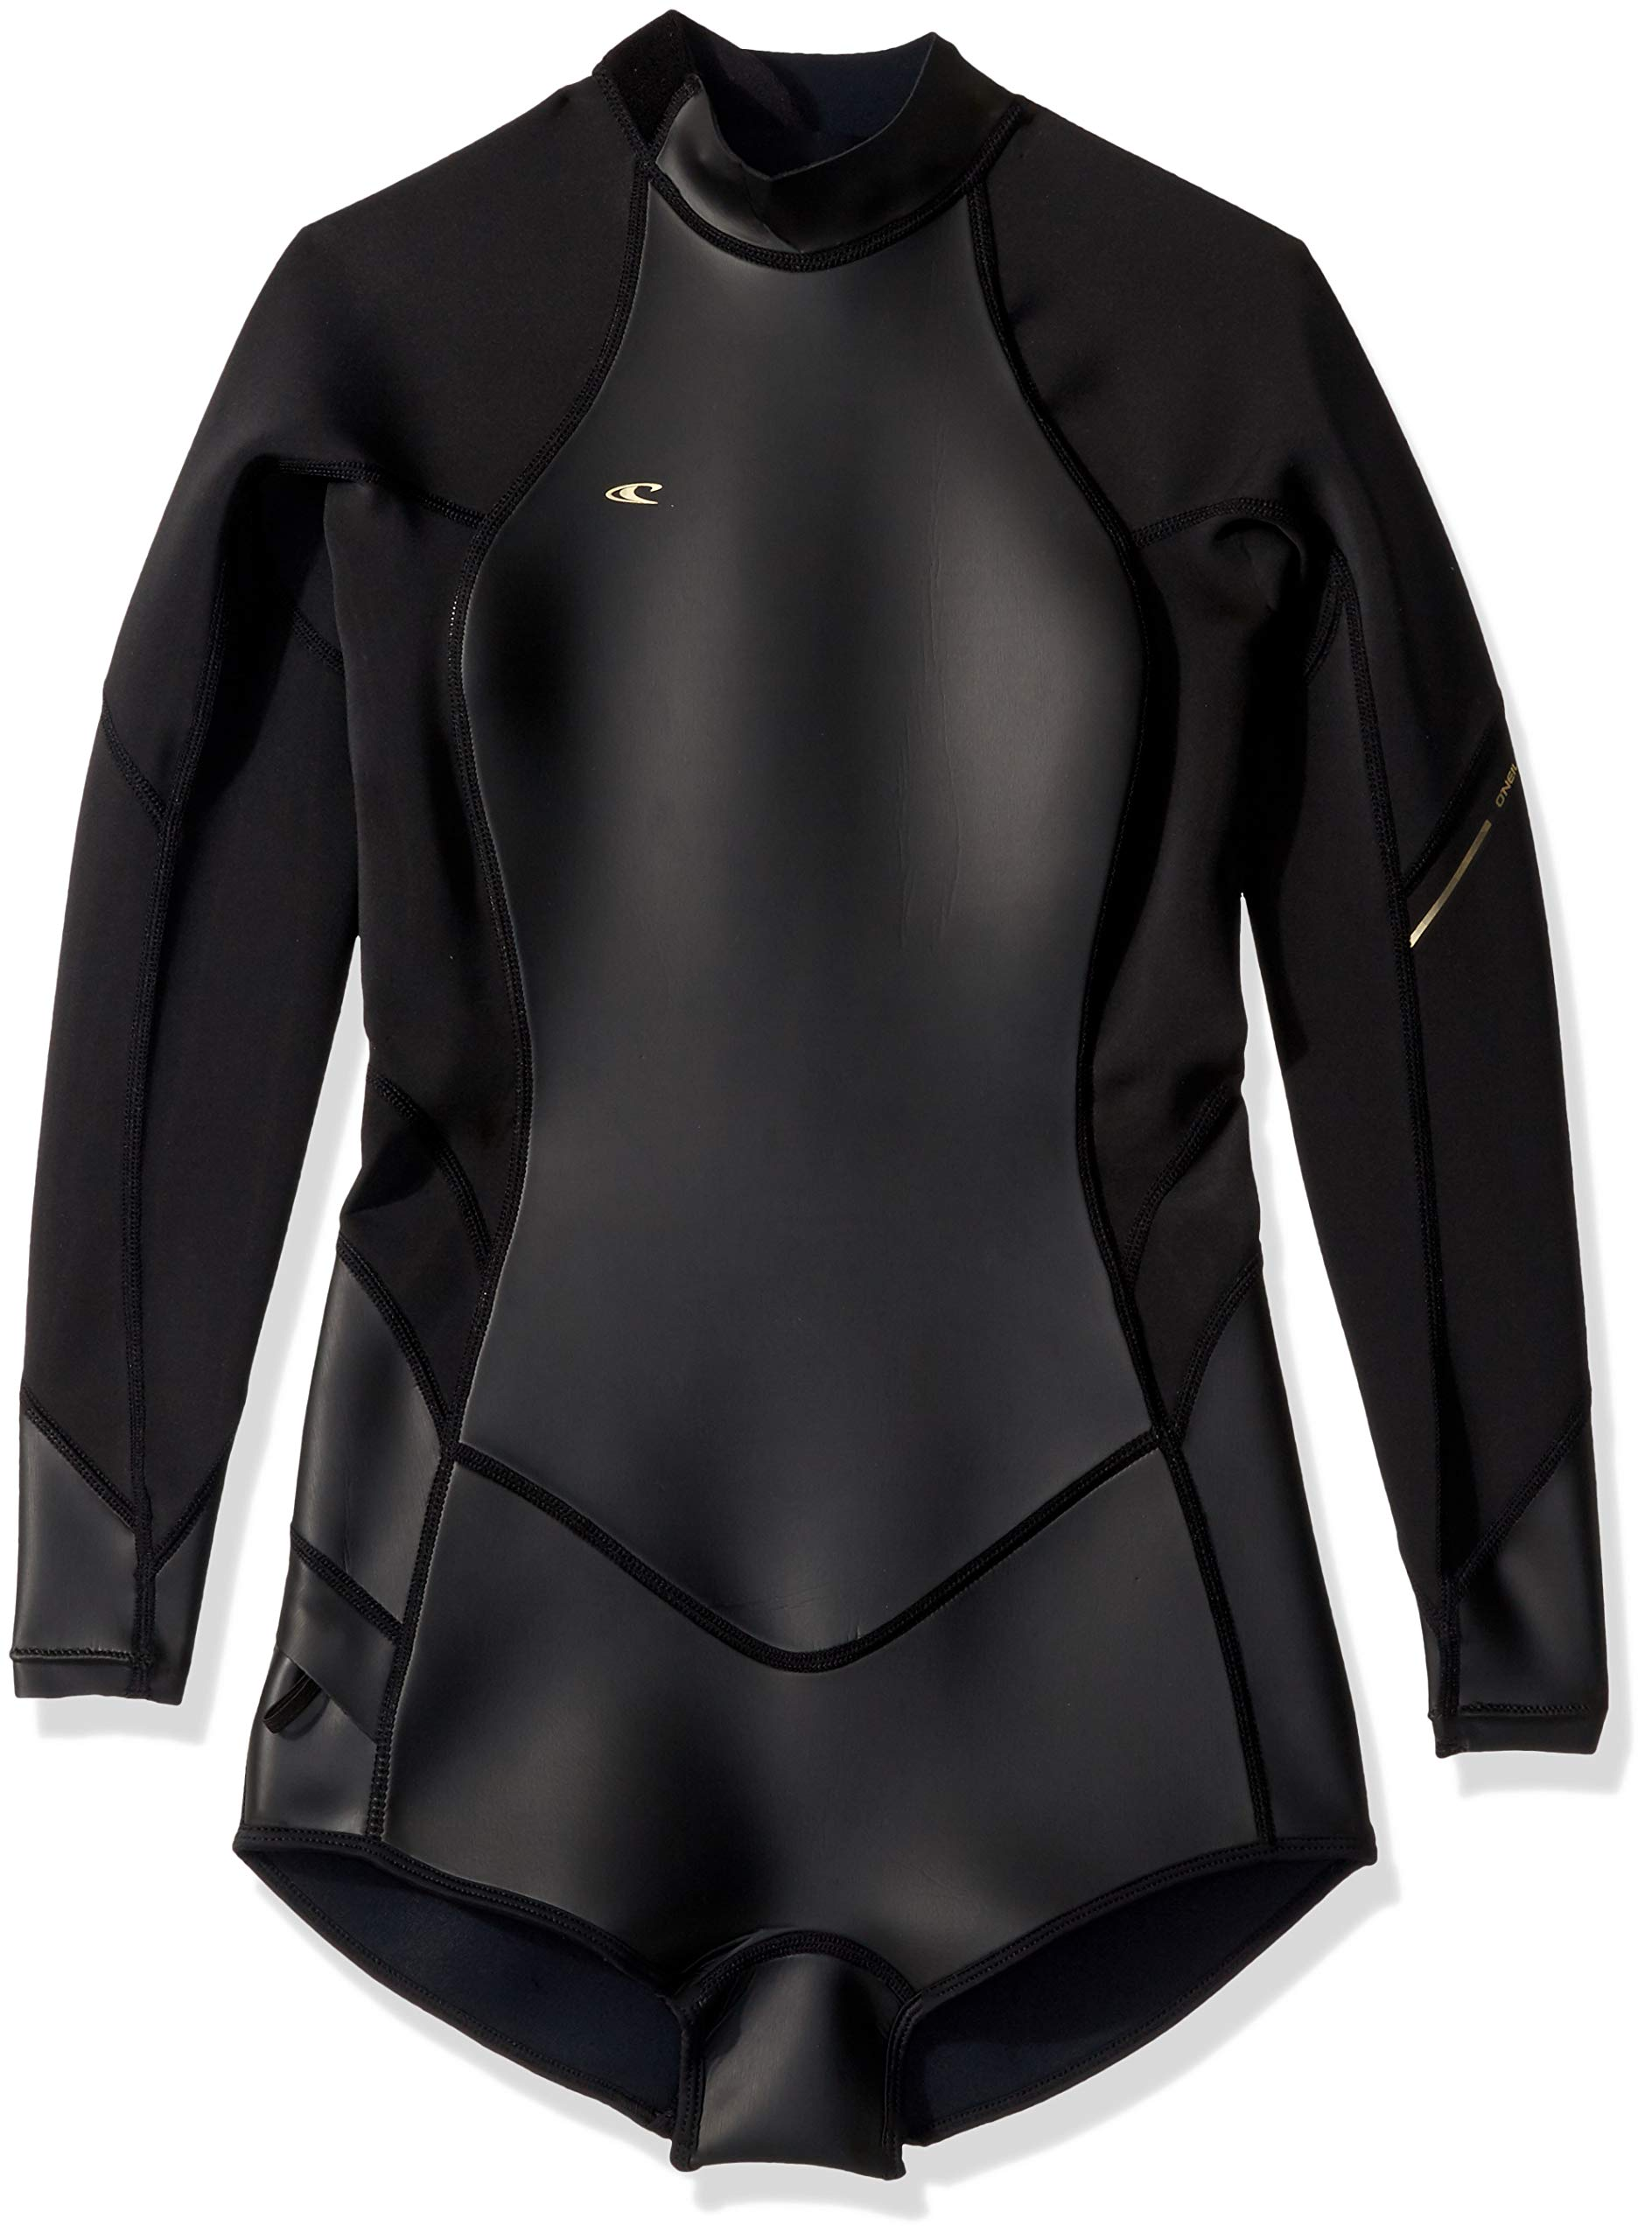 O'Neill Wetsuits Women's Bahia 2/1mm Back Zip Long Sleeve Short Spring, Glide Black/Black/Black, Size 4